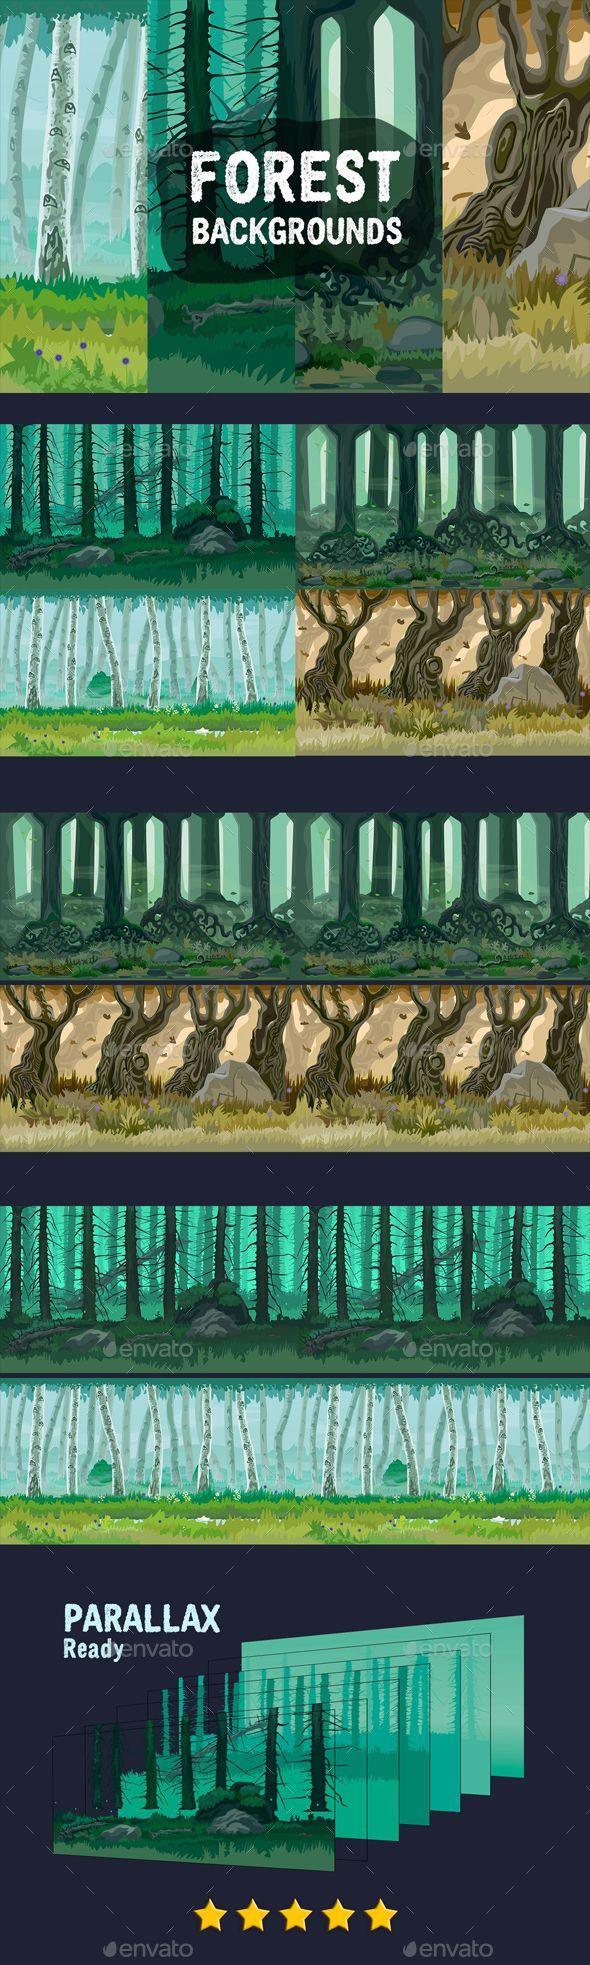 Forest Game Backgrounds Download link: https://graphicriver.net/item/forest-game-backgrounds/20811521?ref=KlitVogli